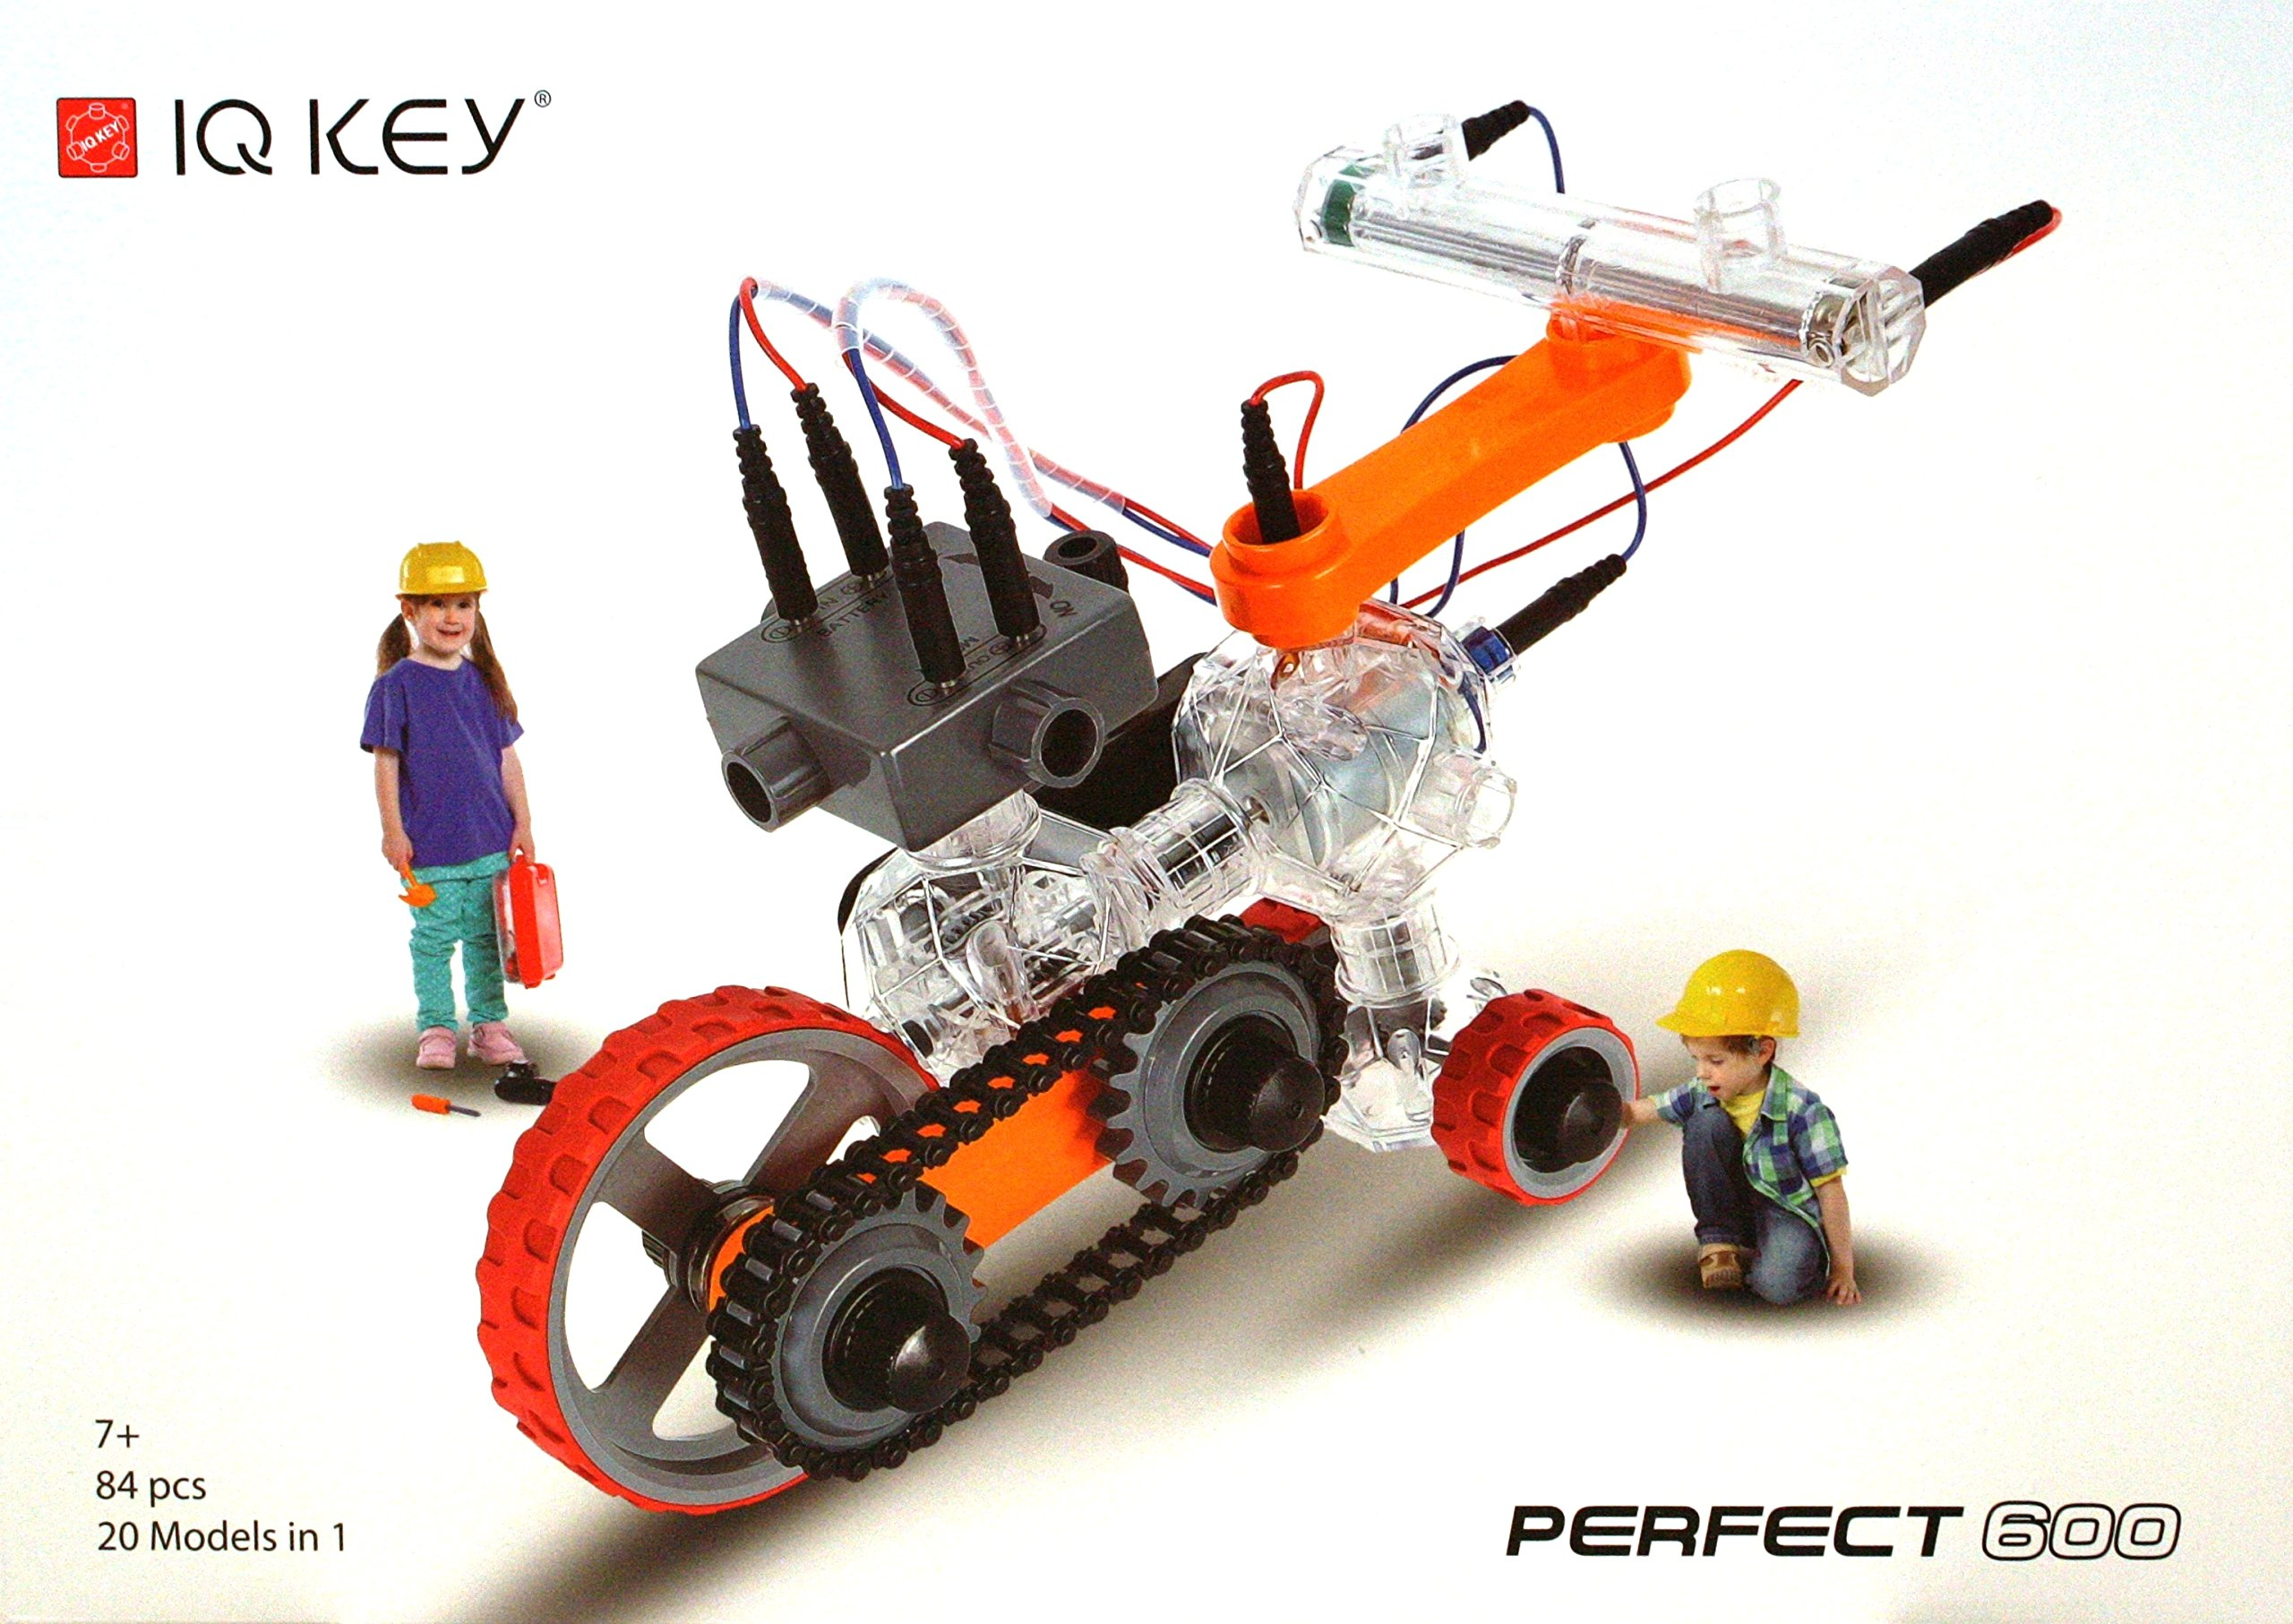 IQ-KEY Perfect 600 -Educational Assembly Toy Kits